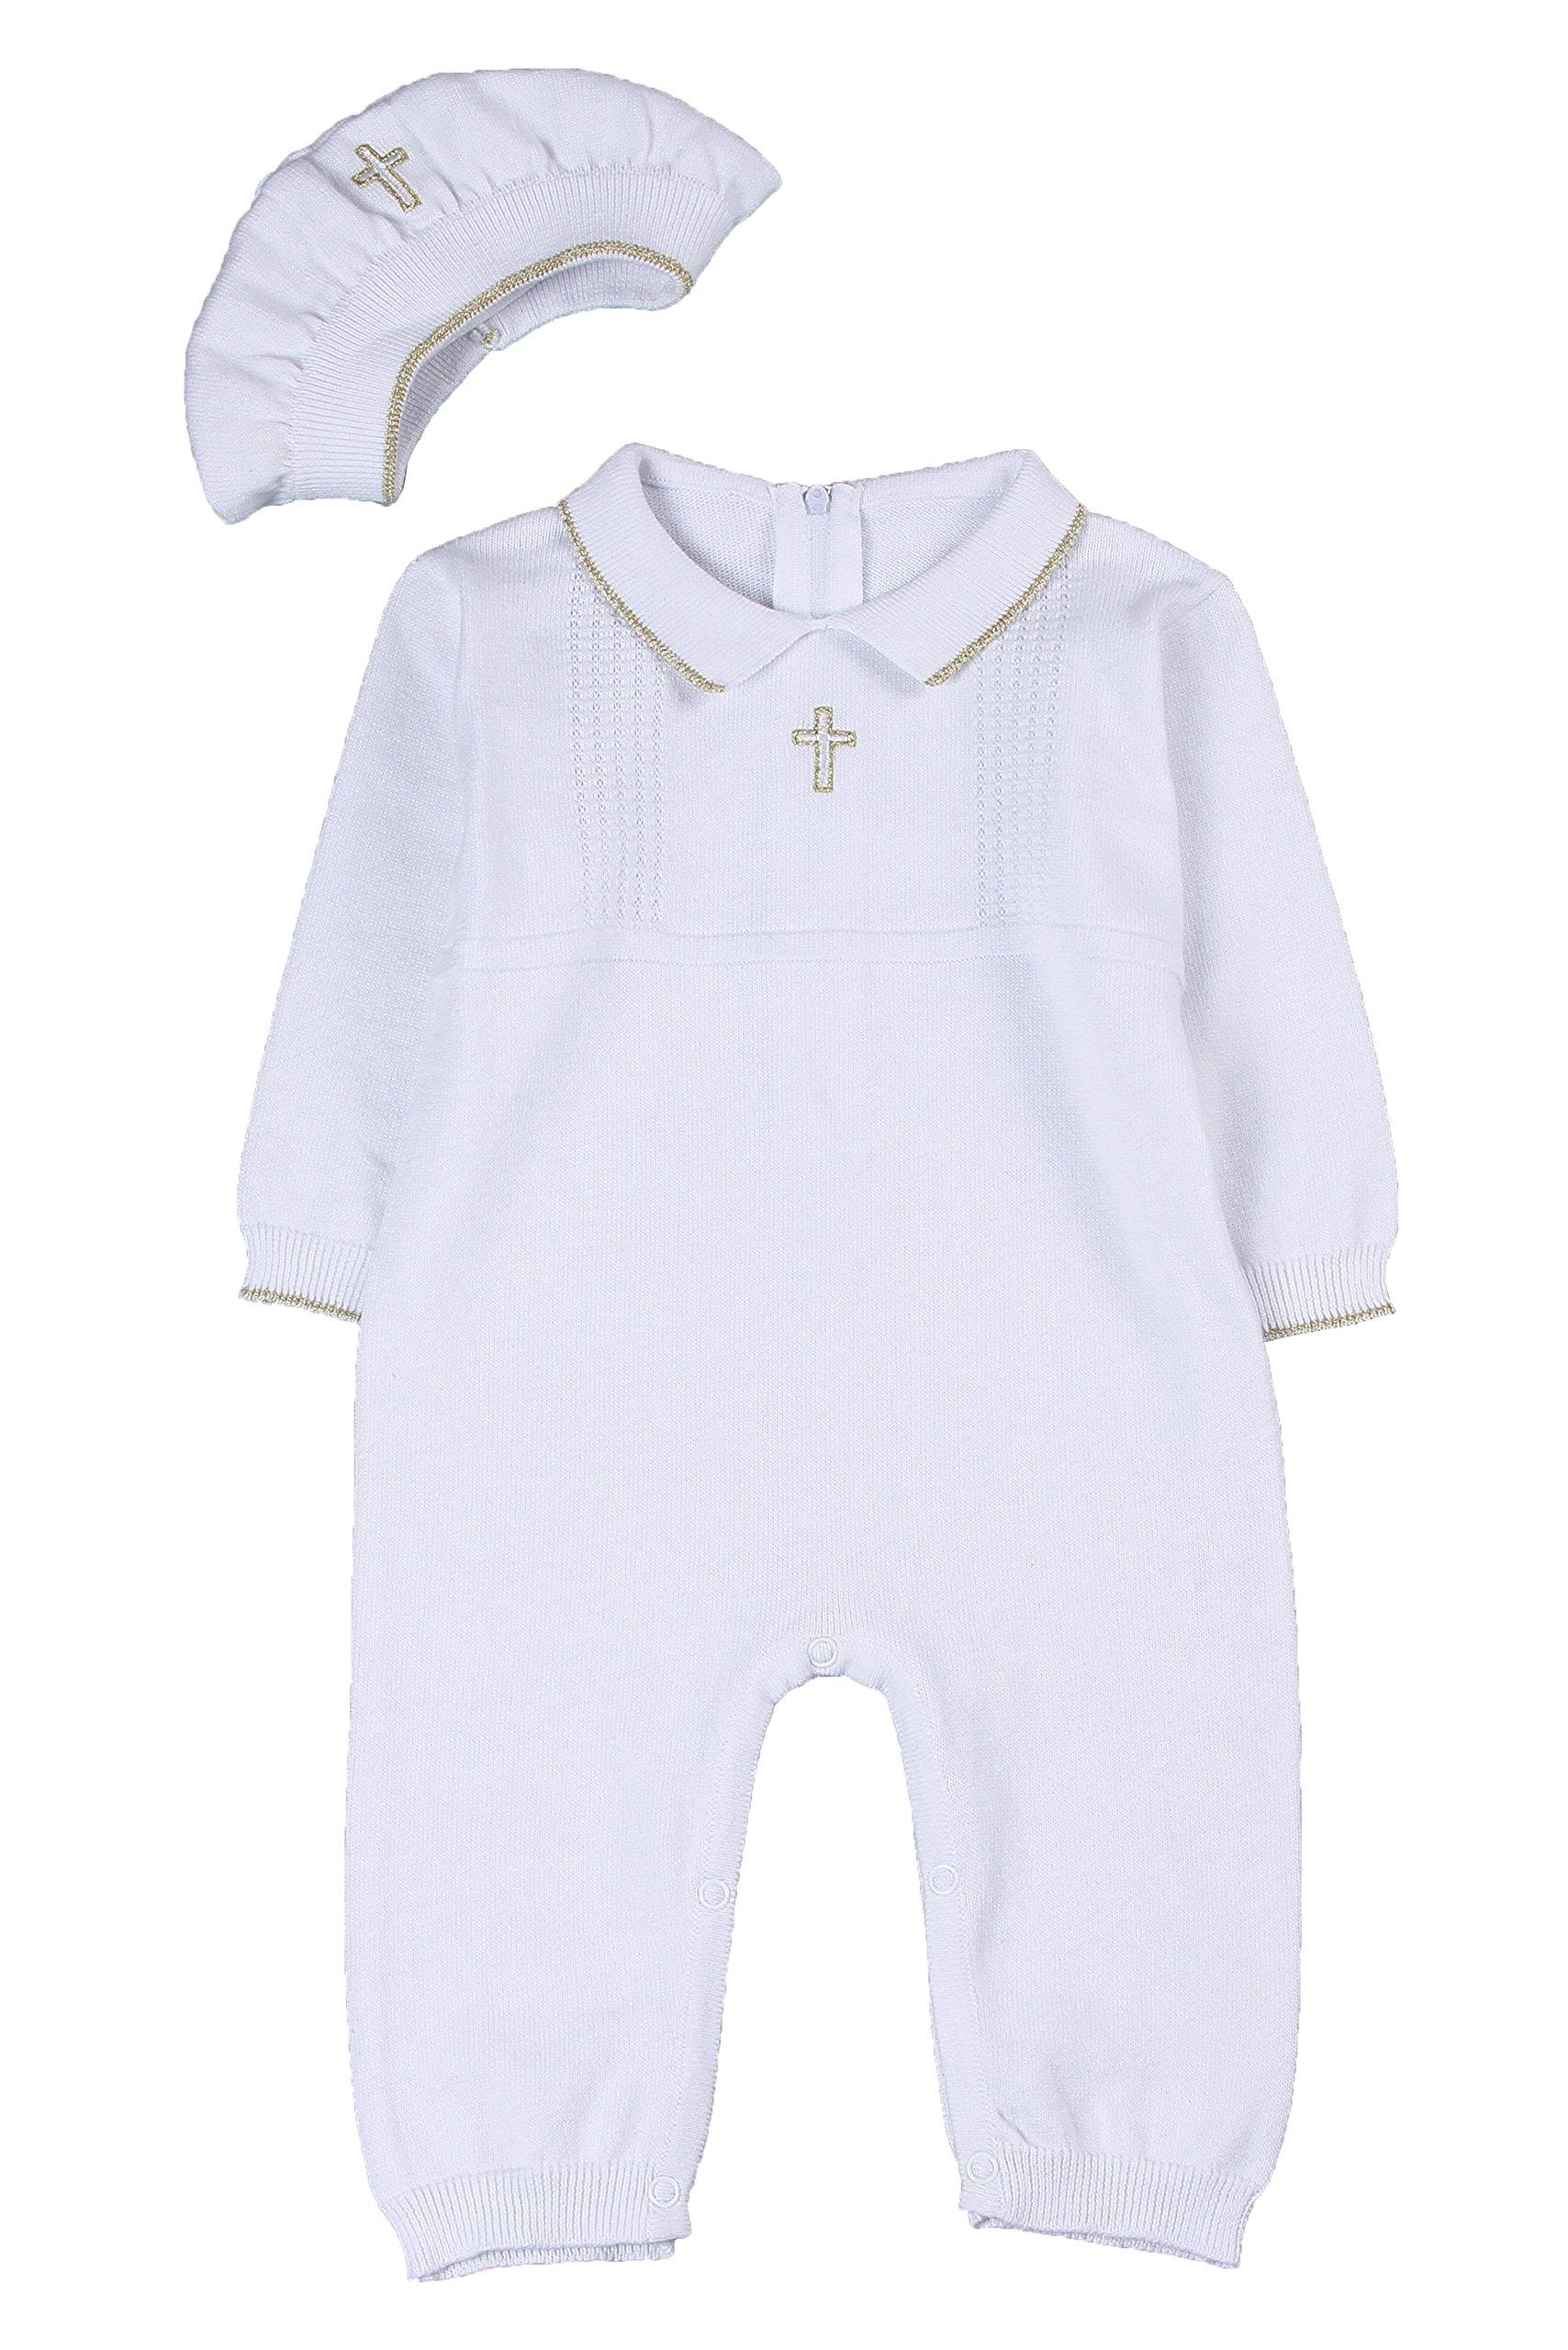 Classykidzshop White Boy Baptism Outfit B2